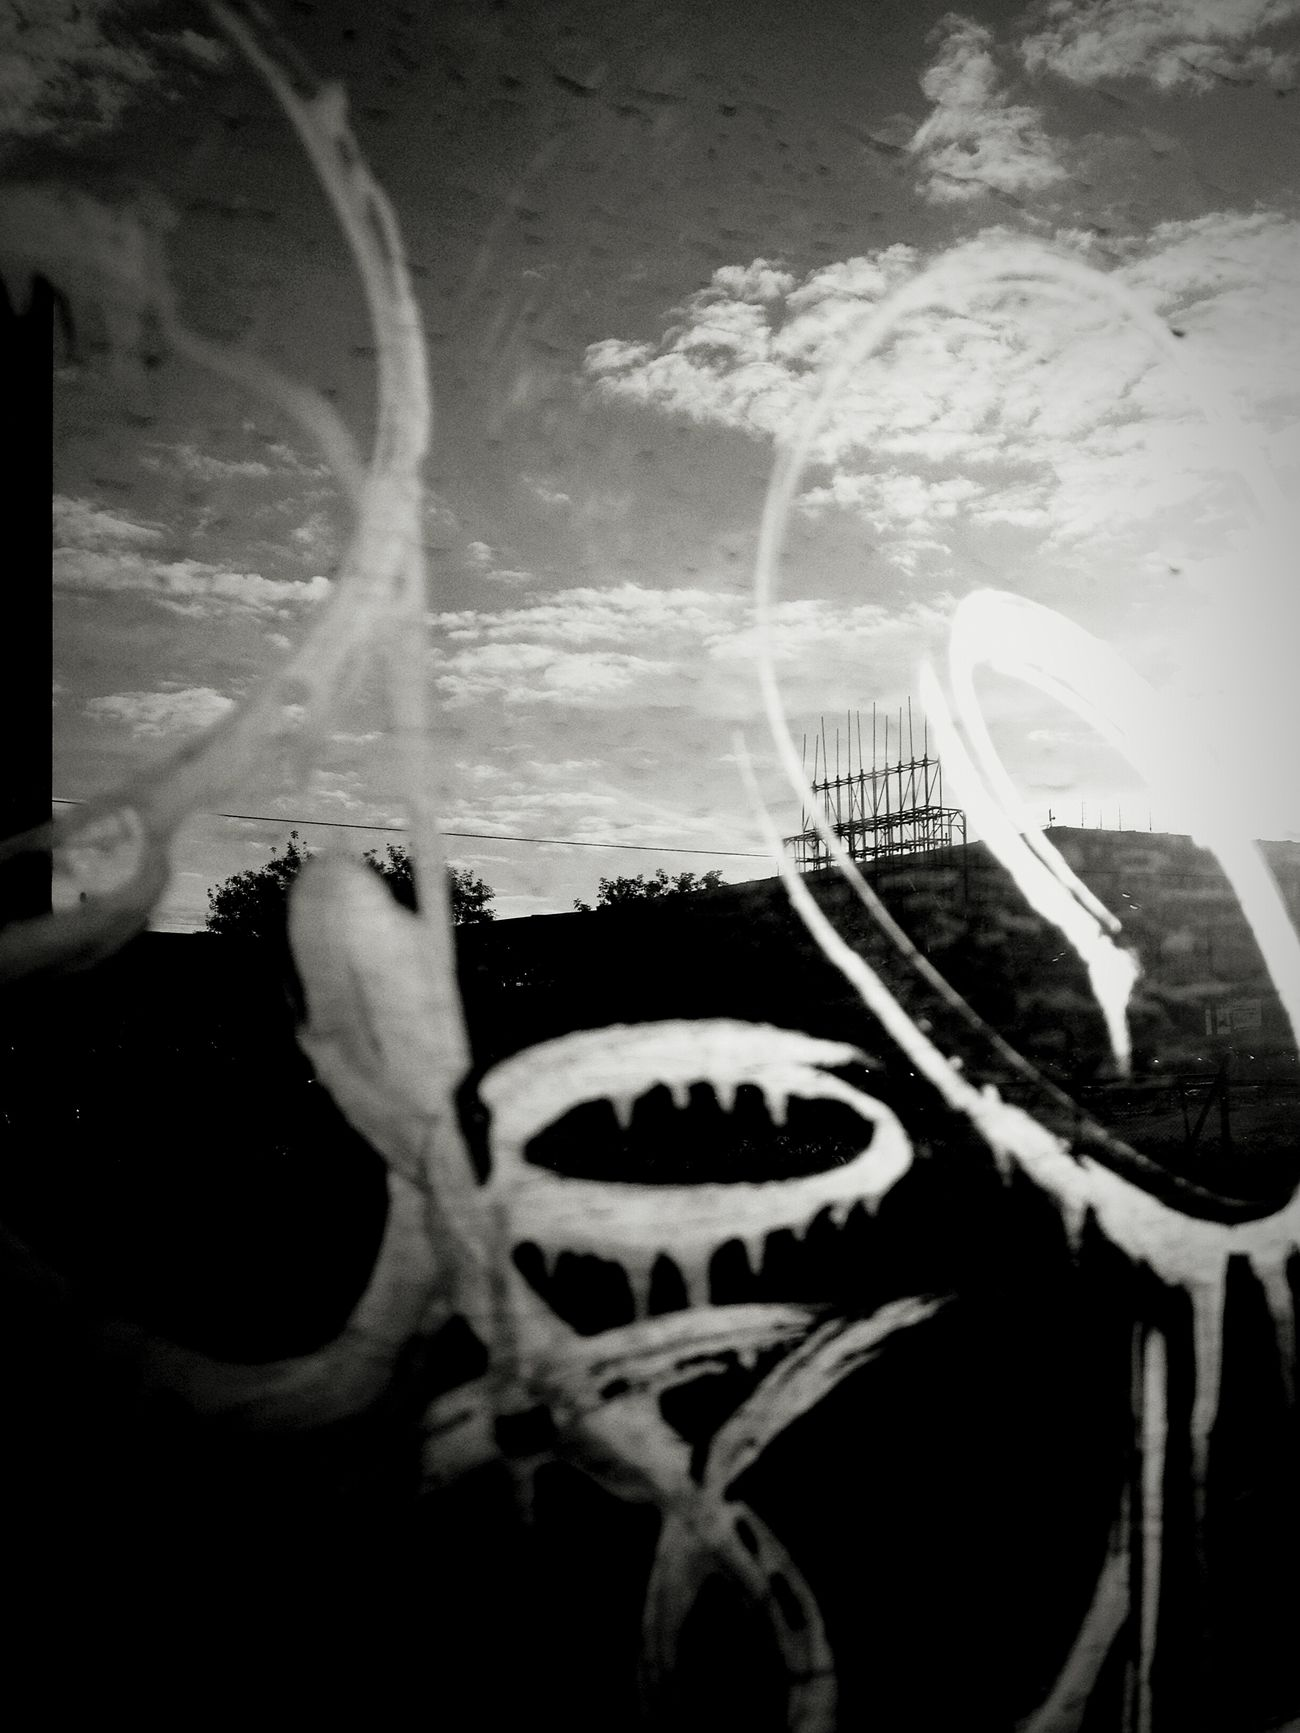 B&w чернобелое подъездноефото подъездное Творчество окно